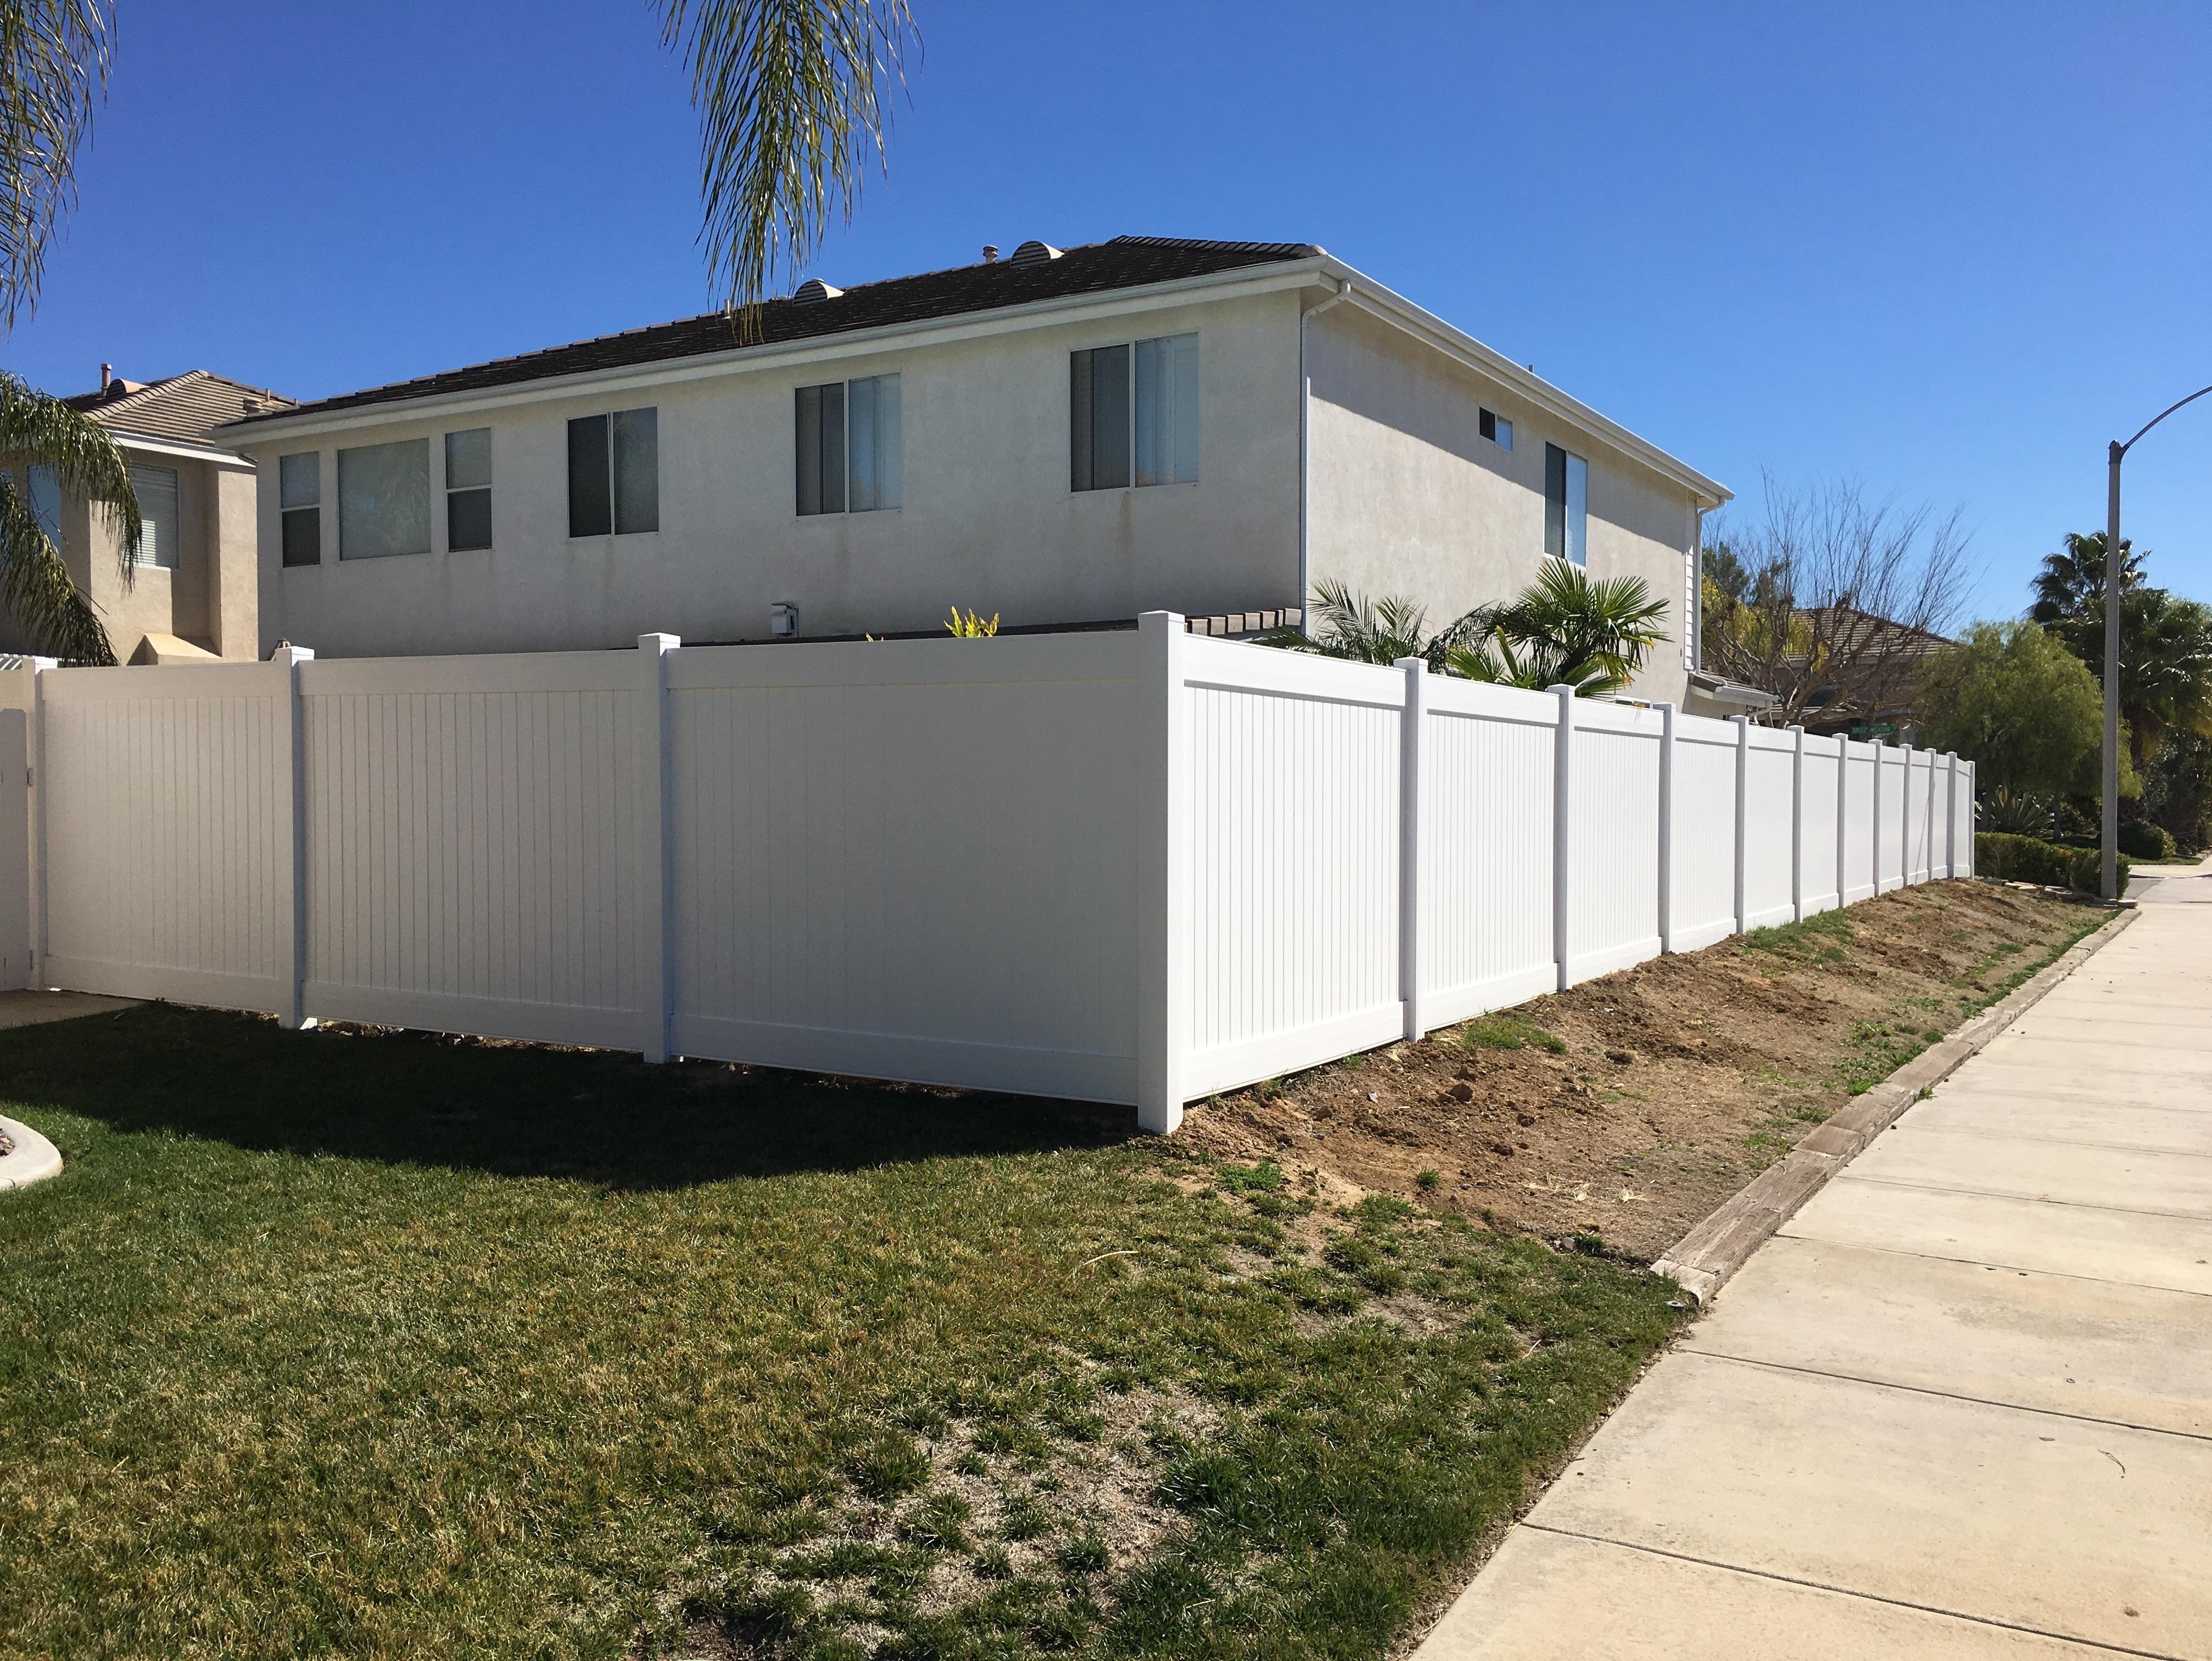 3T Fence image 15